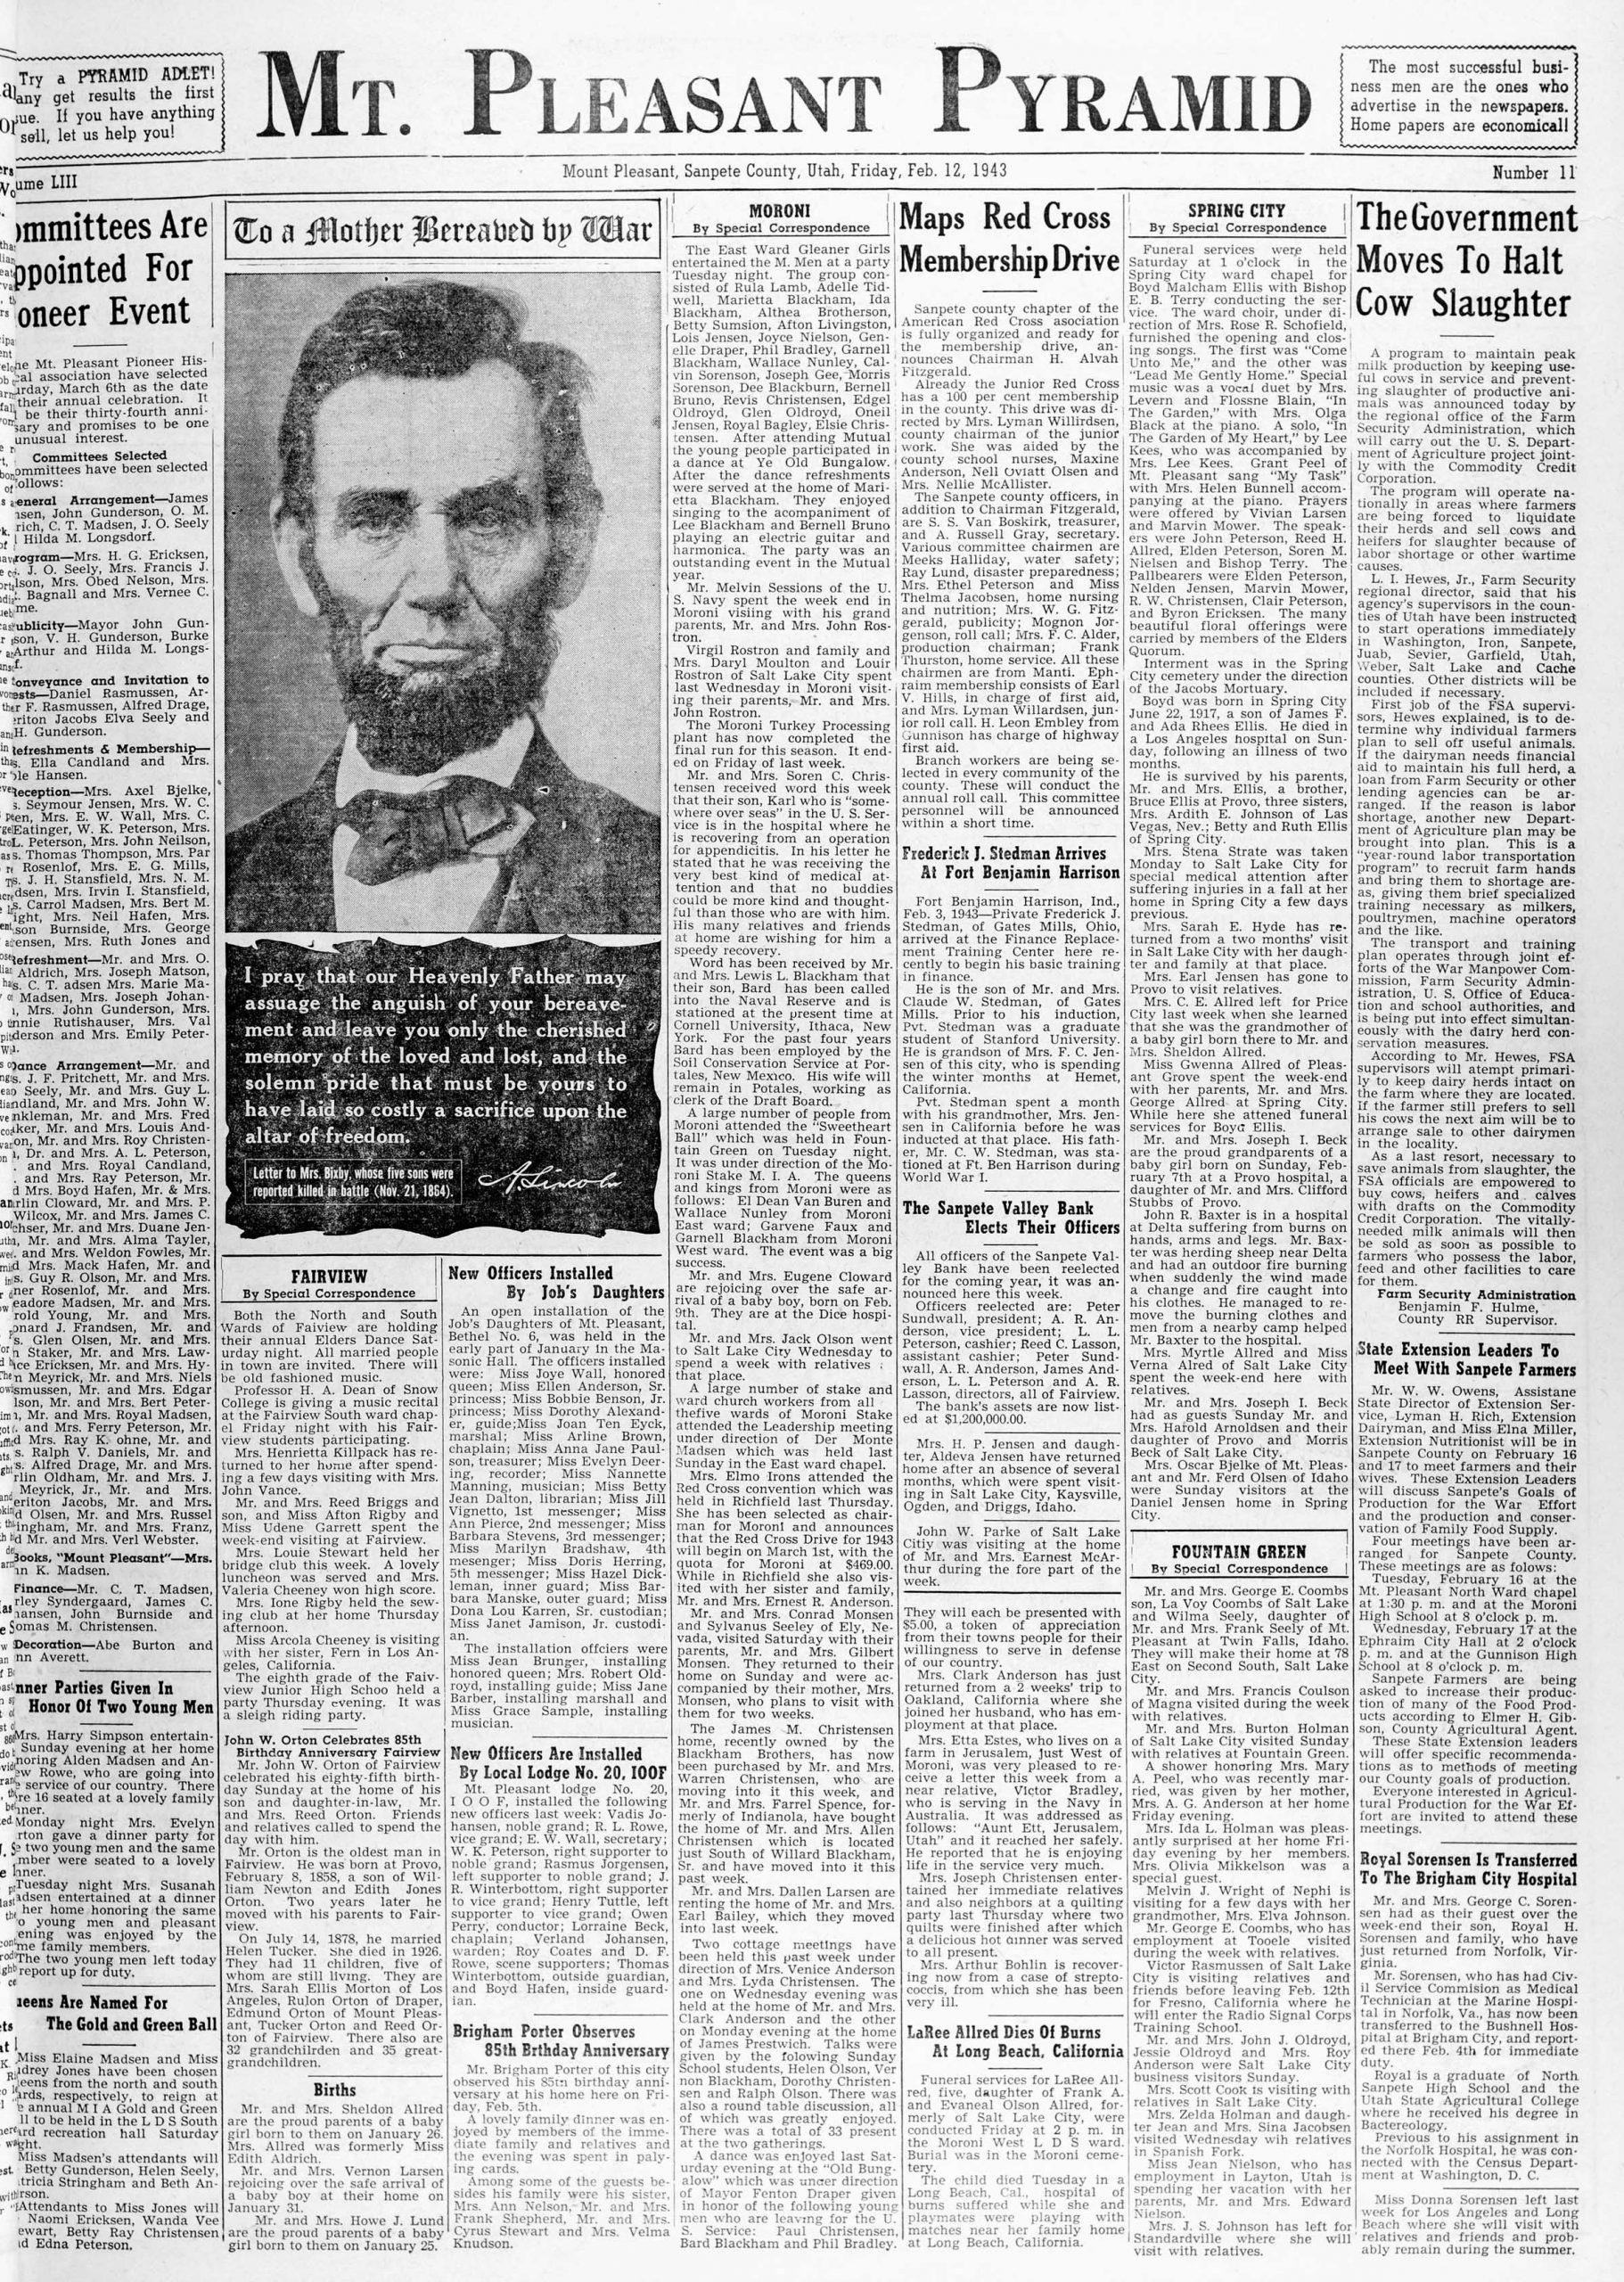 Mt. Pleasant newspaper from 02-12-1943